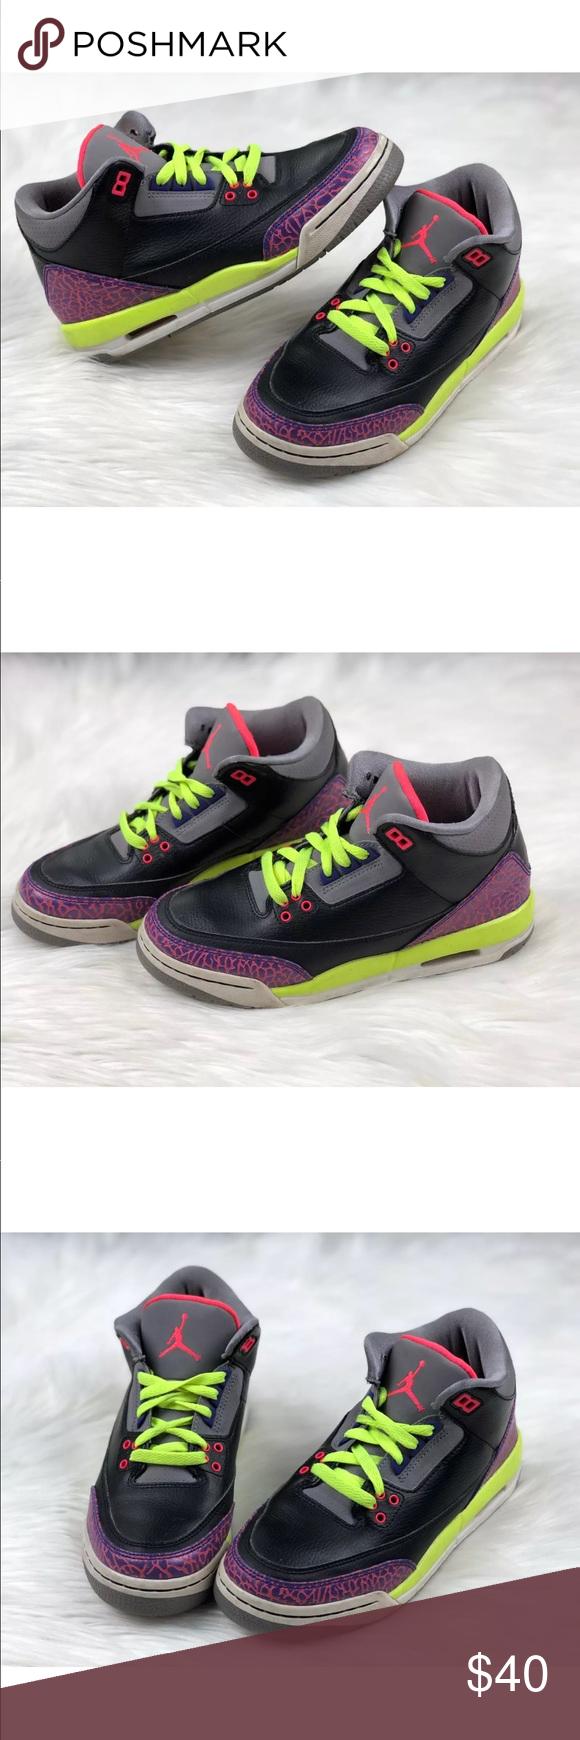 premium selection 6fef0 440d6 Nike Air Jordan 3 Retro 6Y Black Joker Shoes Girls Nike Air Jordan 3 Retro  GS SZ 6Y Black Atmoic Joker Shoes 441140-039 Preowned good condition.